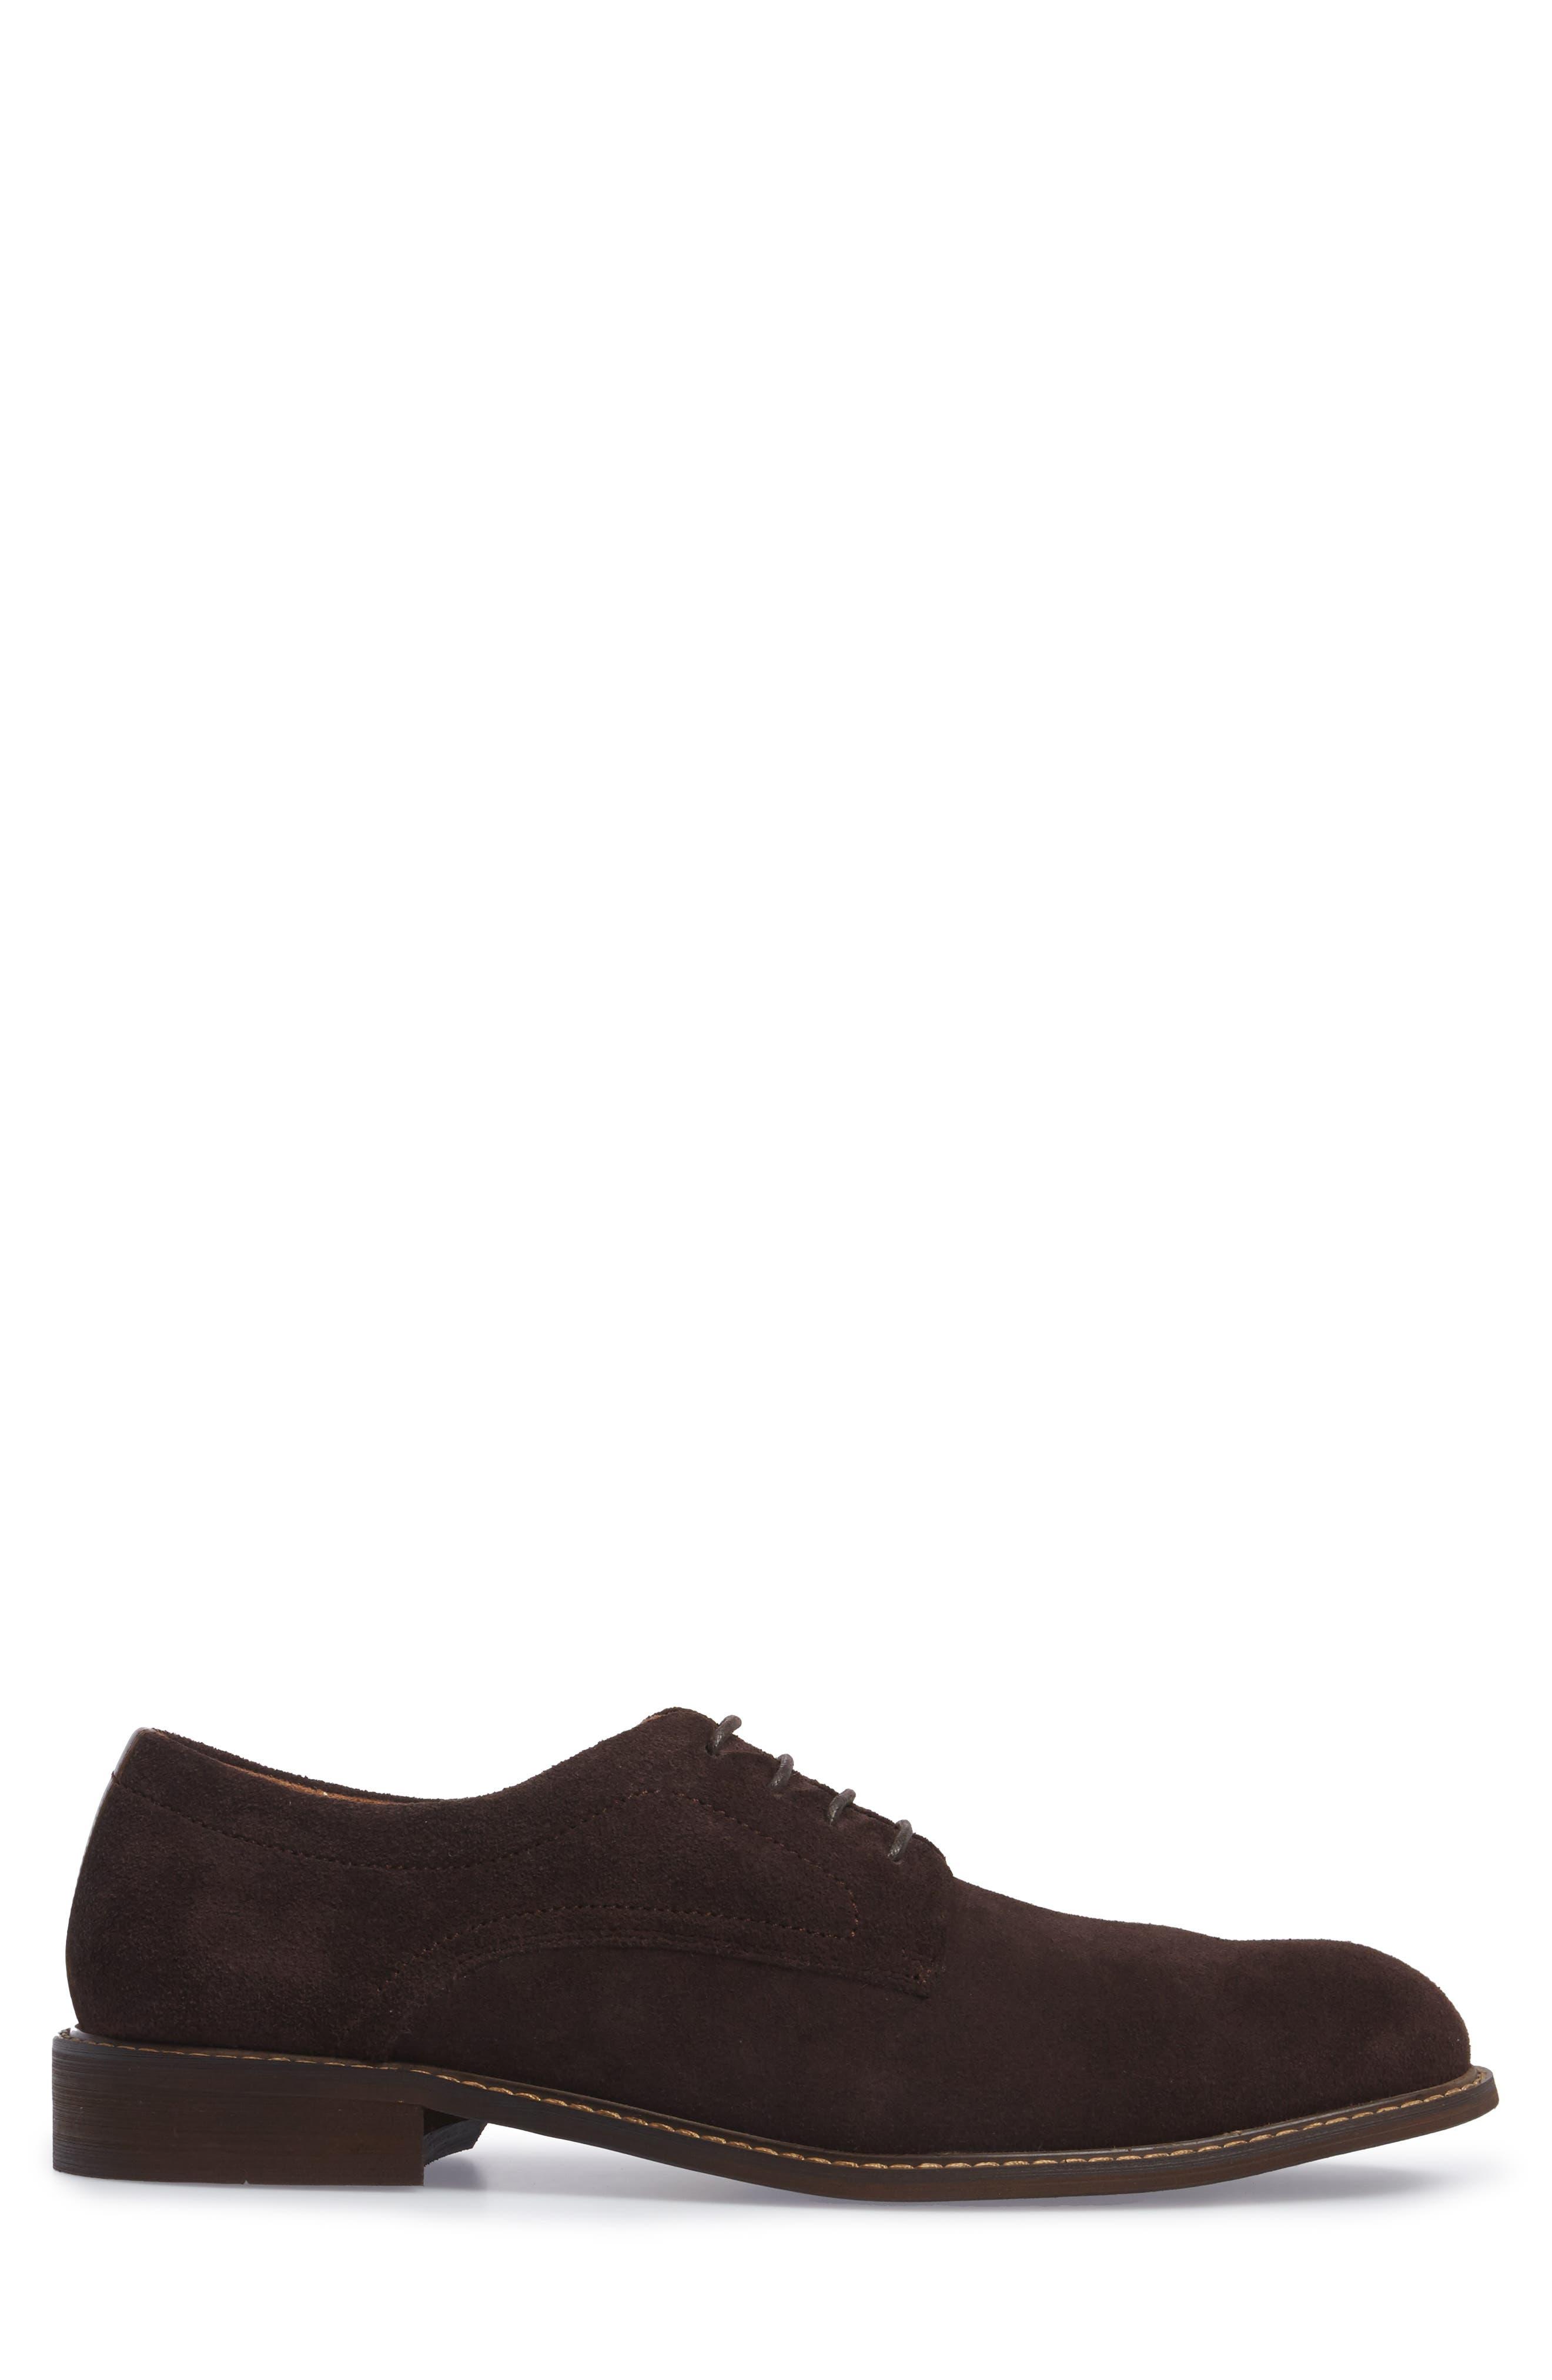 Buck Shoe,                             Alternate thumbnail 3, color,                             Chocolate Suede